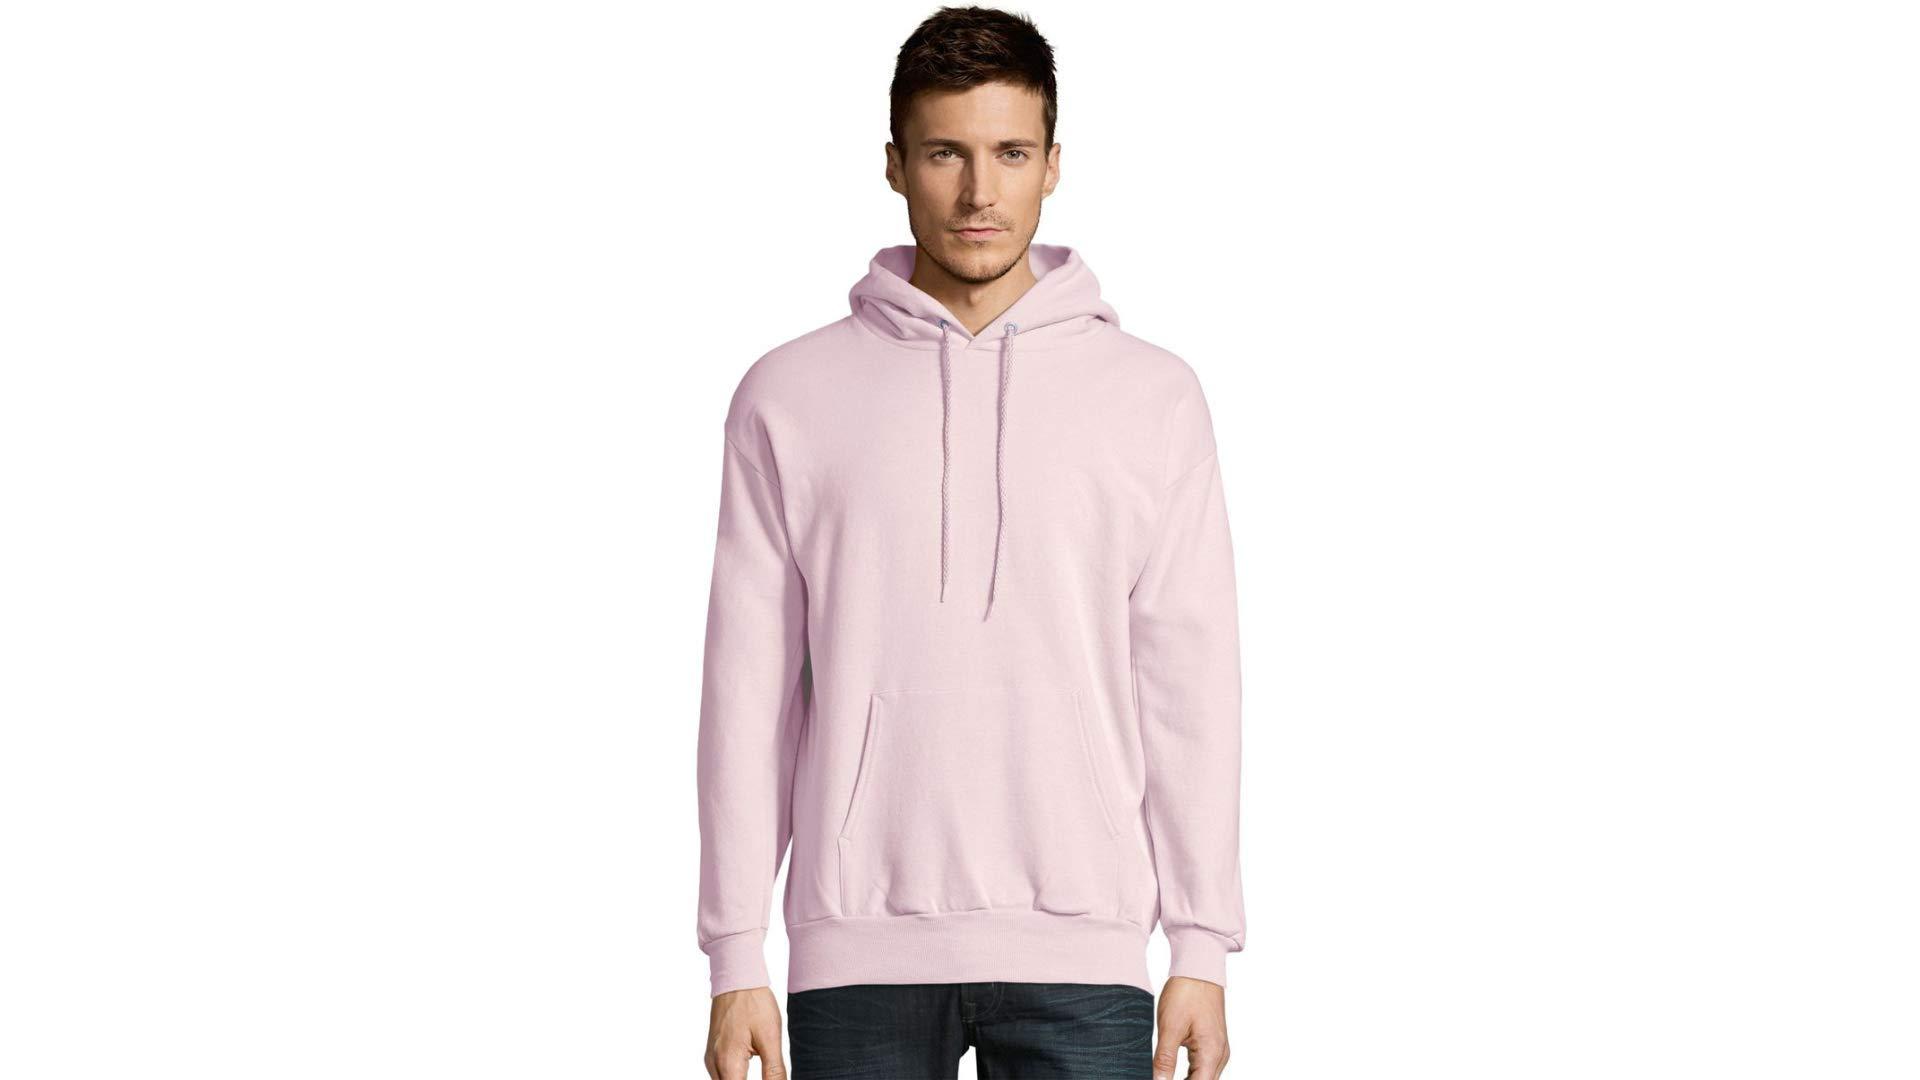 Fashion Shopping Hanes Men's Pullover Eco-Smart Fleece Hooded Sweatshirt